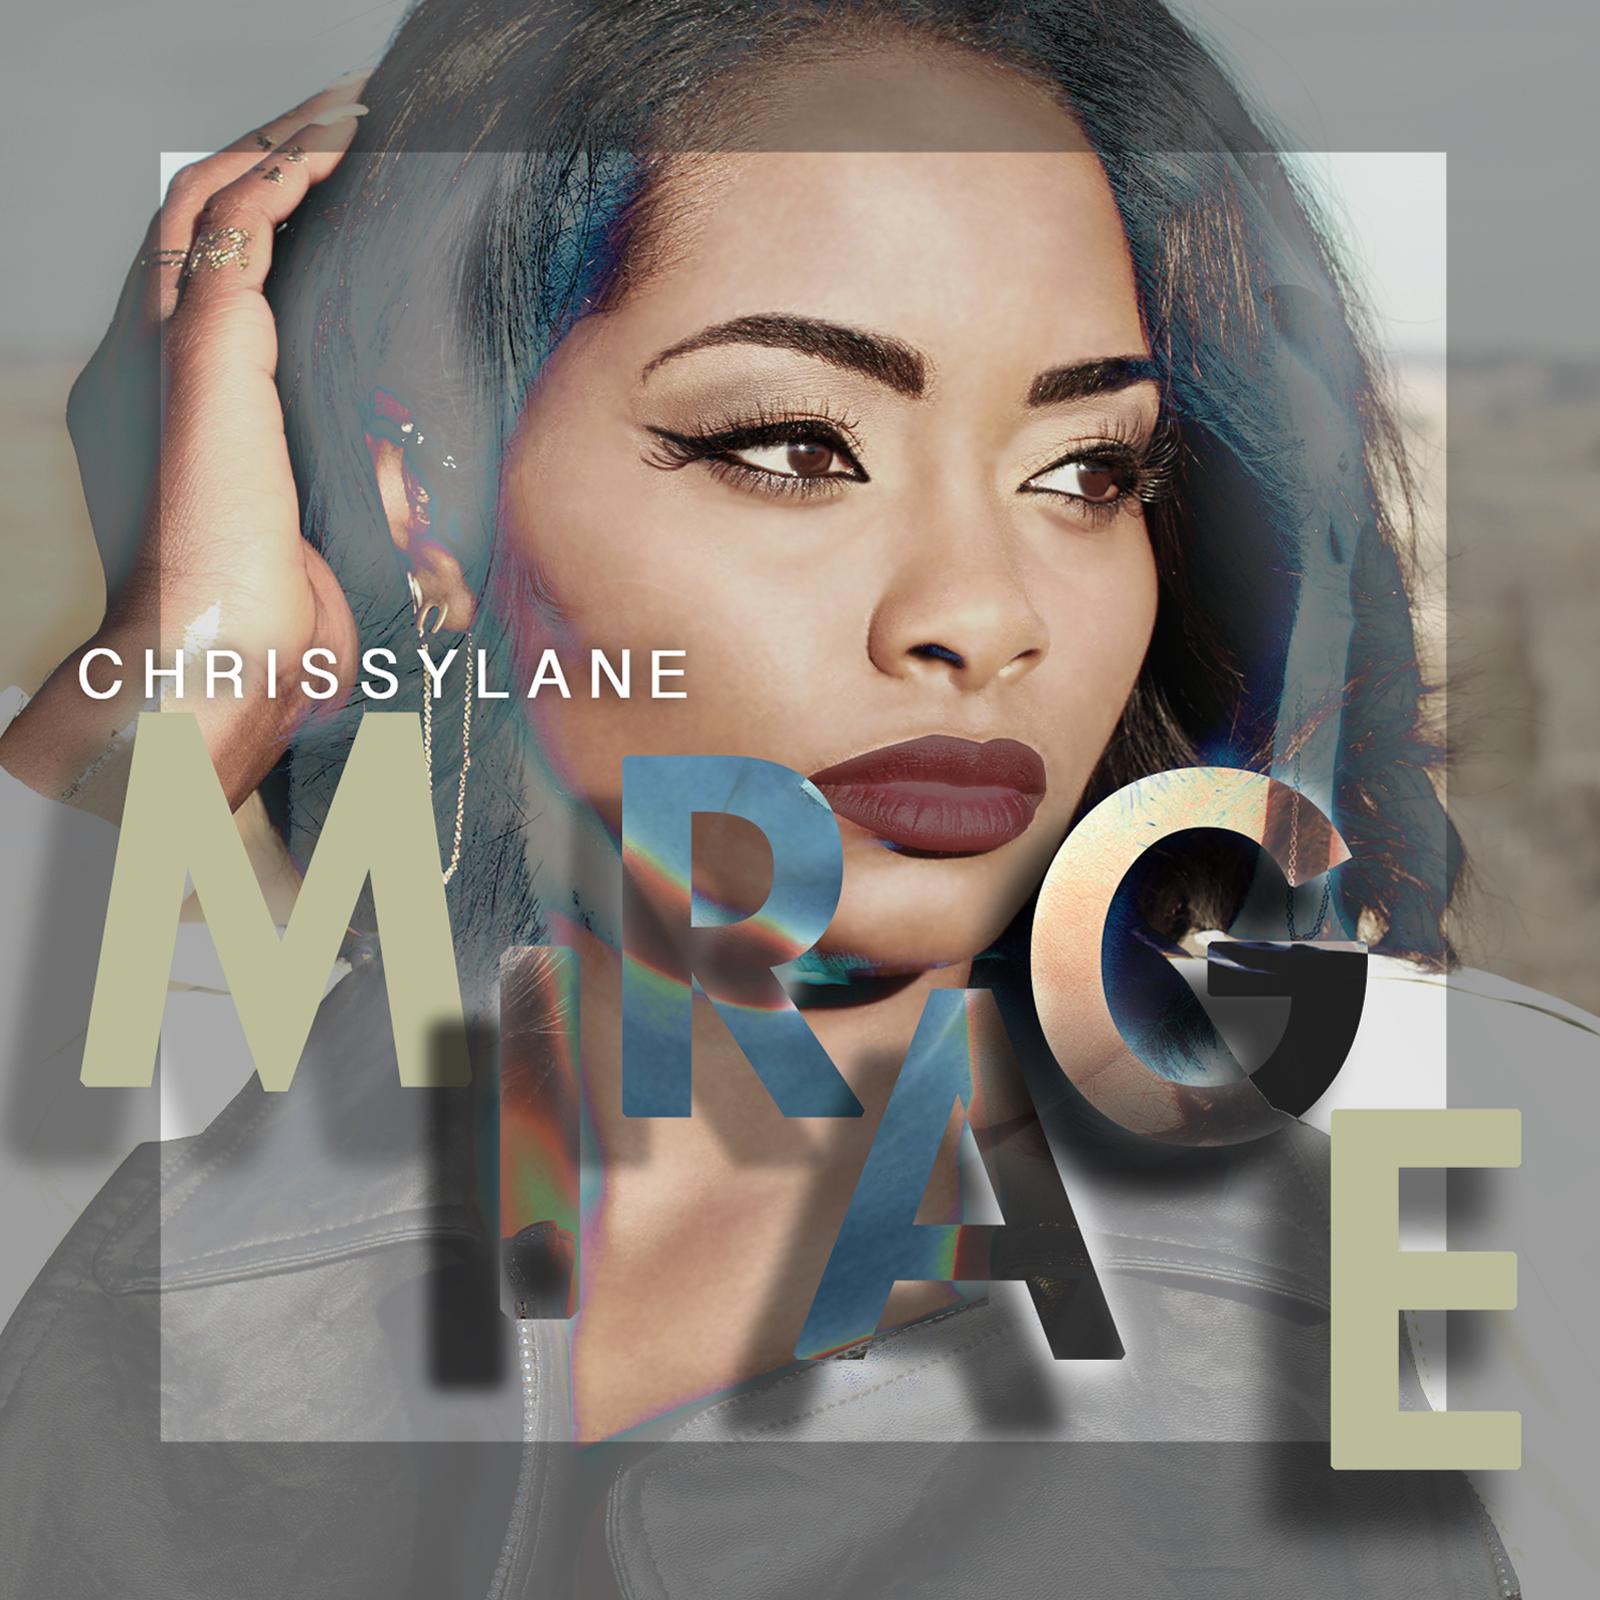 MIRAGE COVER_CHRISSYLANE.png